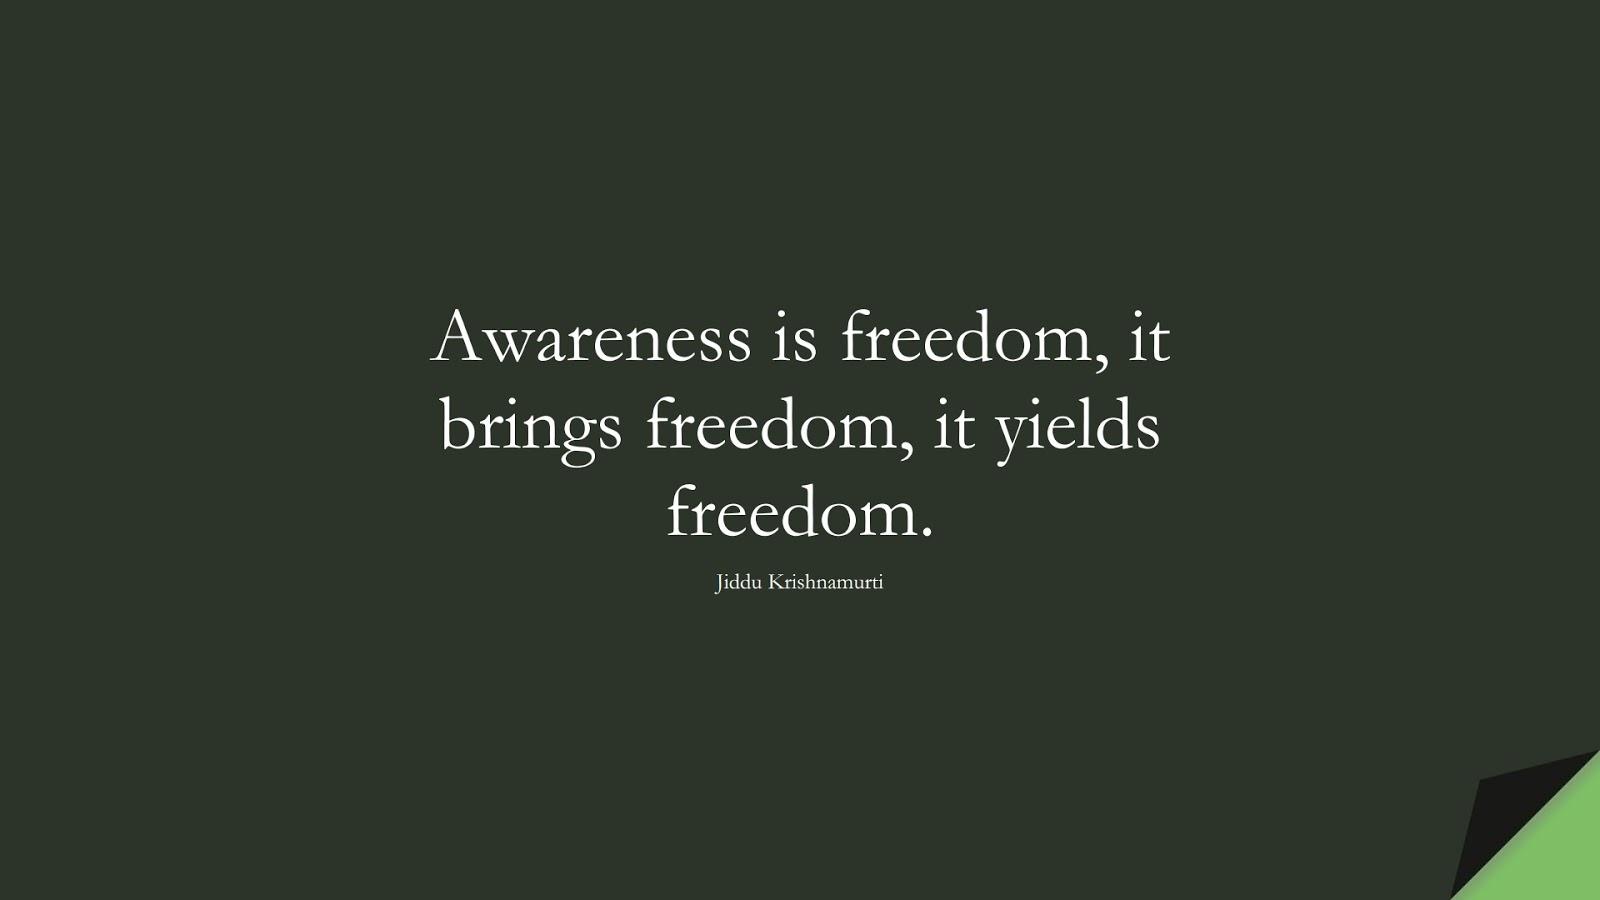 Awareness is freedom, it brings freedom, it yields freedom. (Jiddu Krishnamurti);  #ShortQuotes